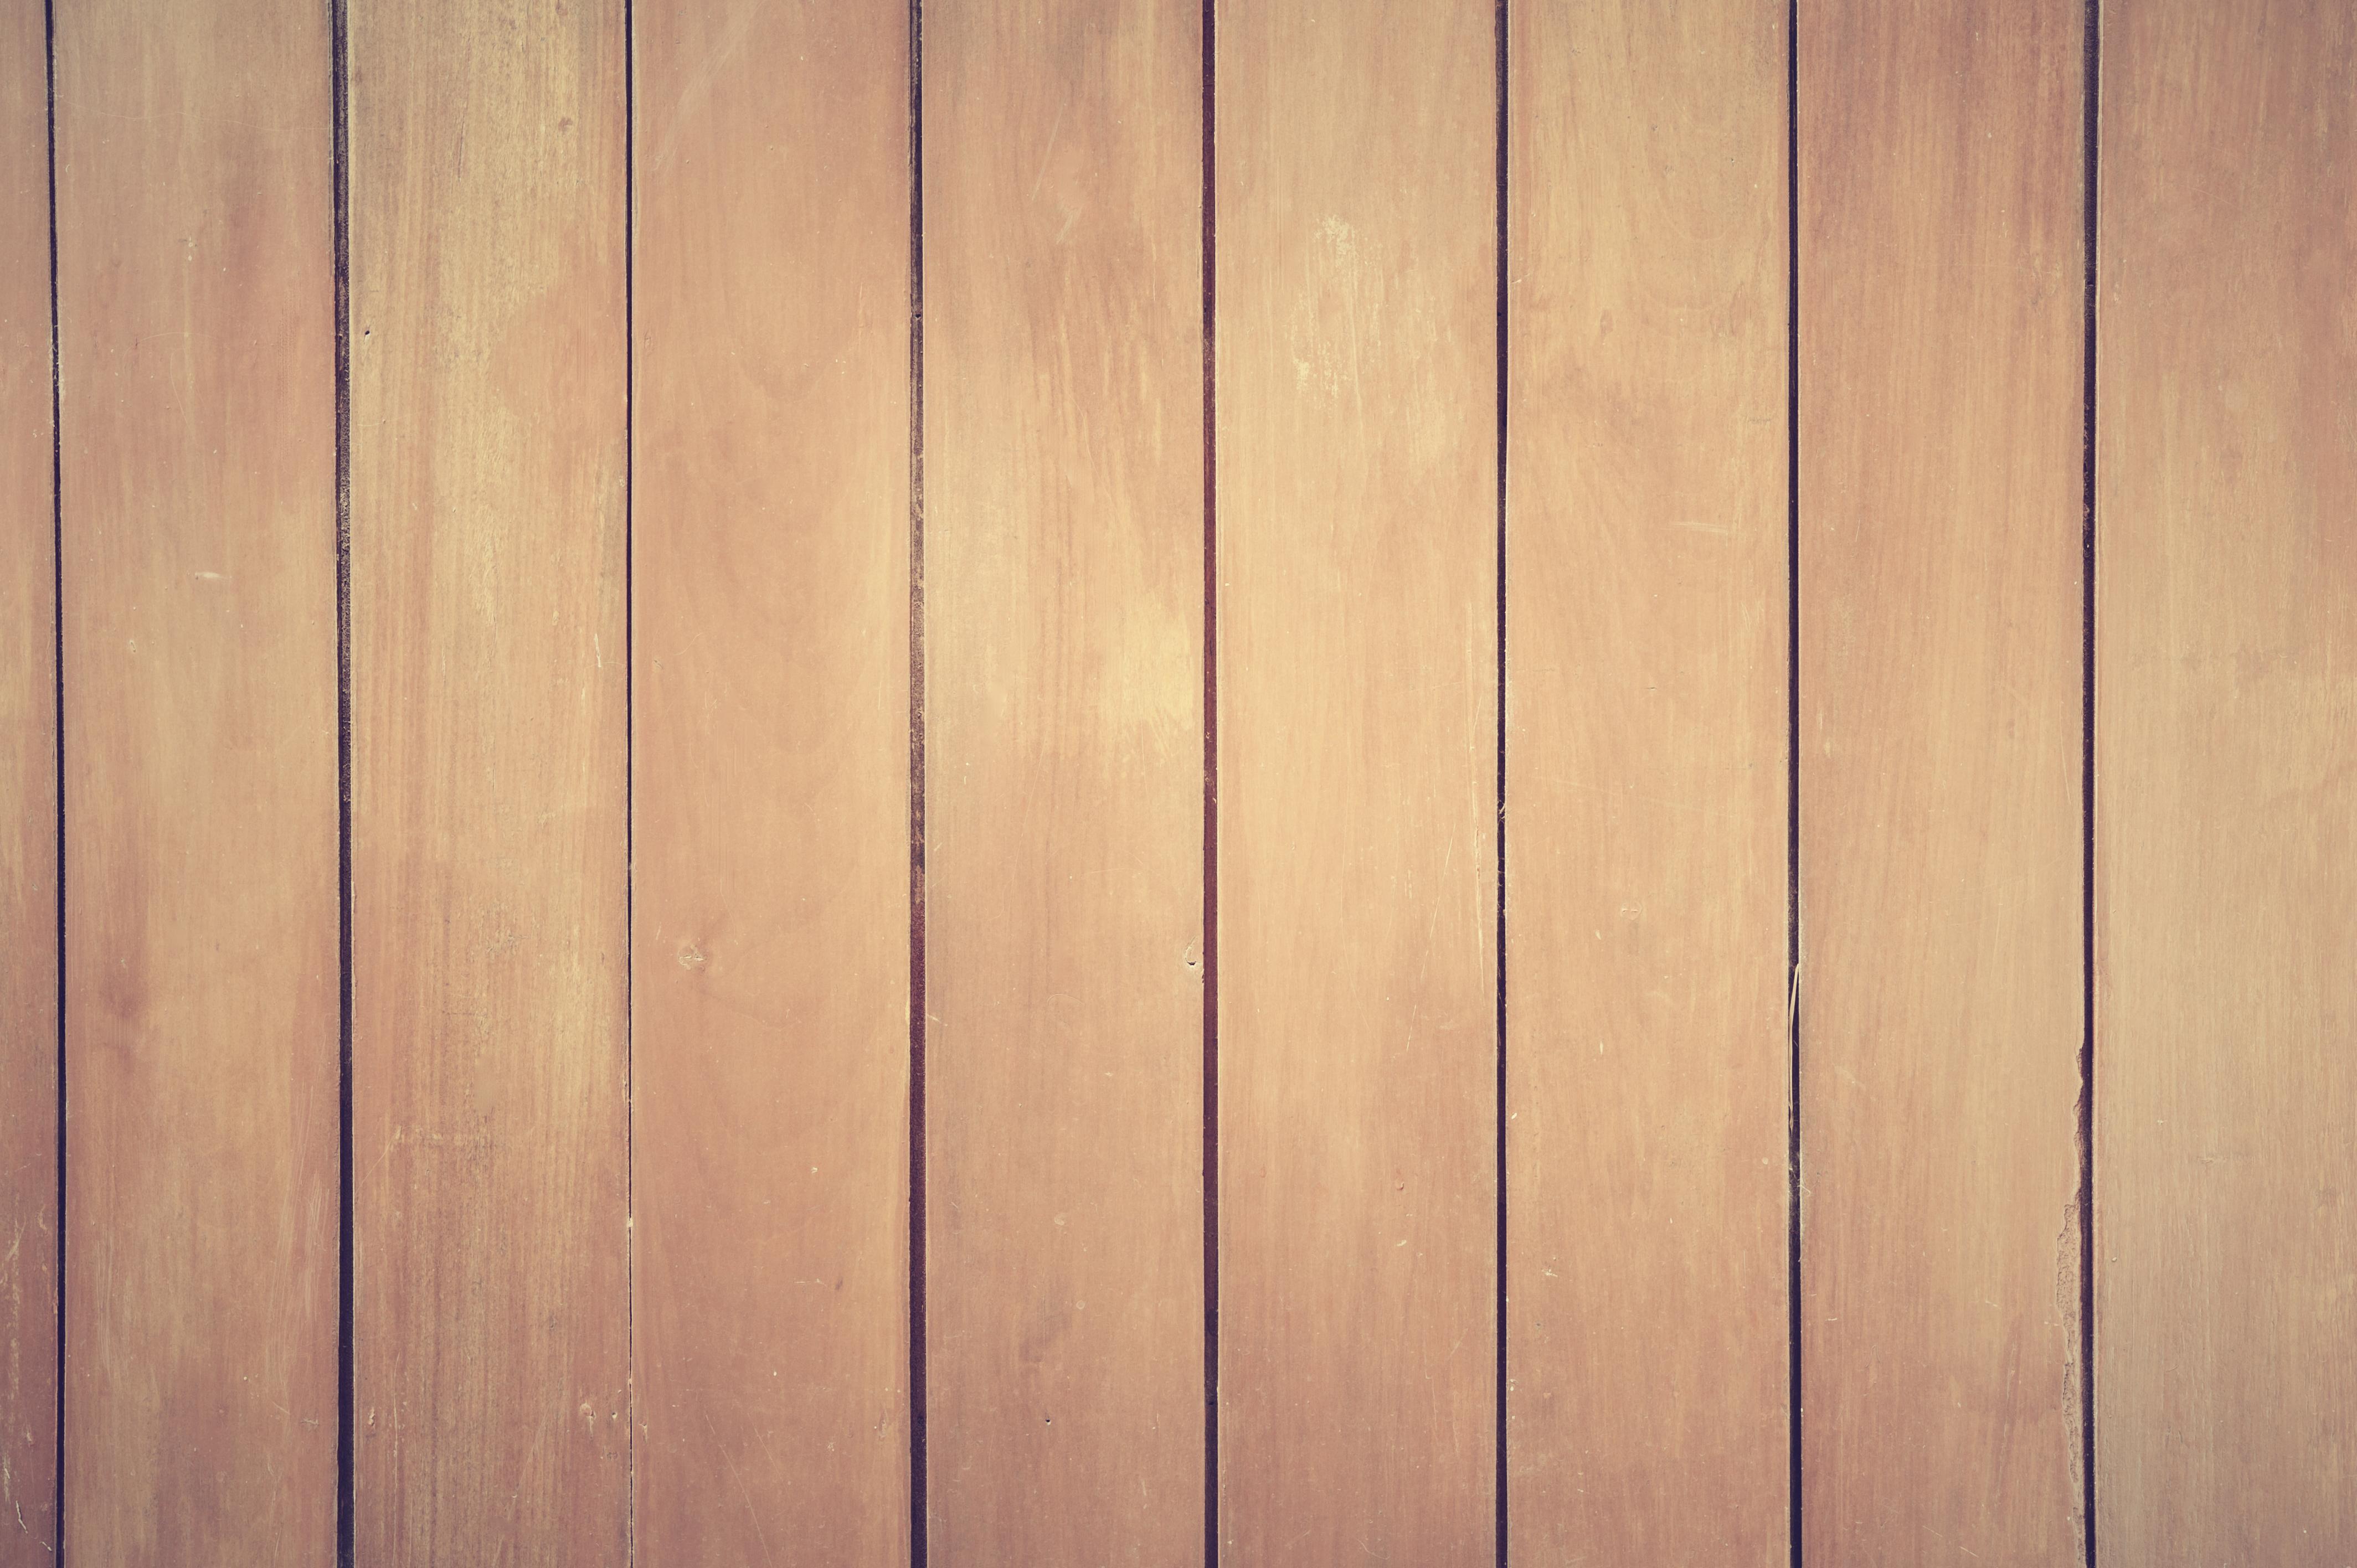 Gray Wood Plank  Free Stock Photo